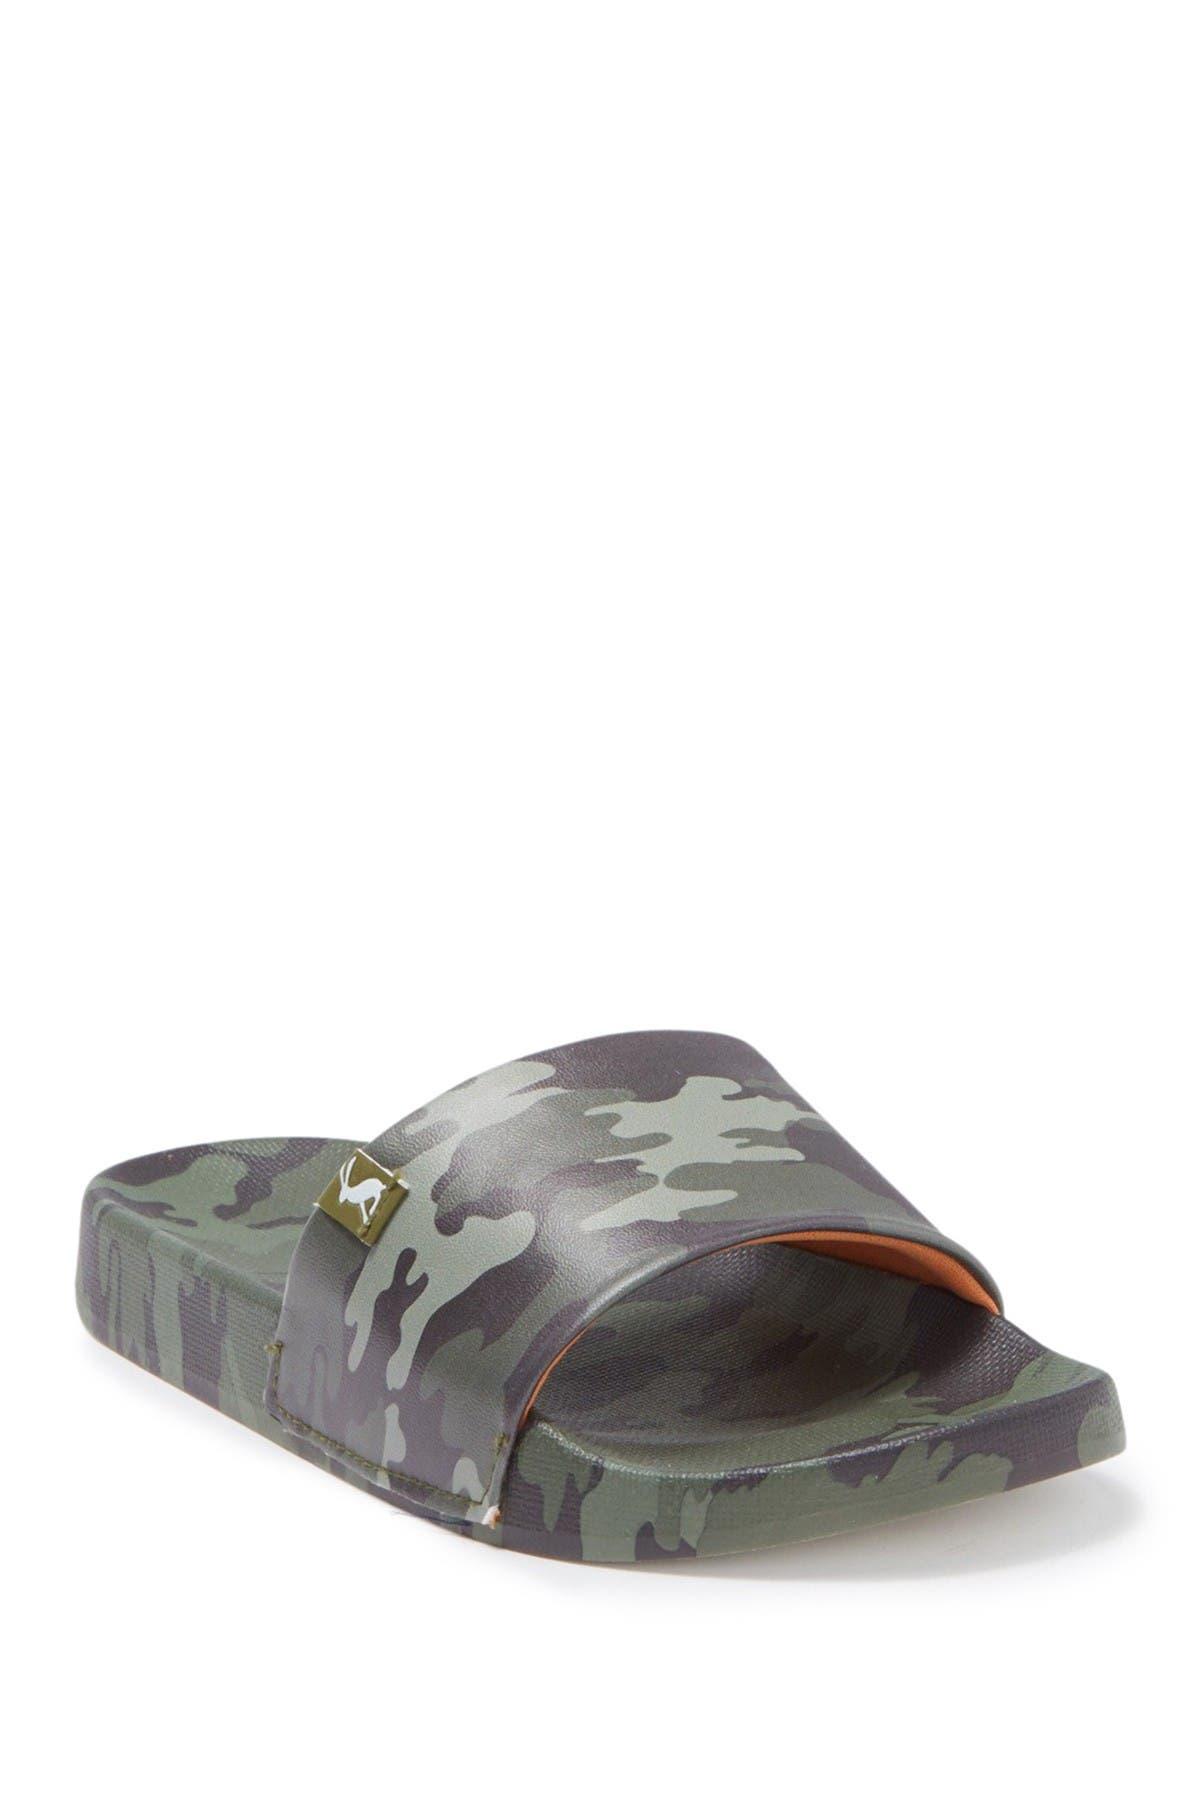 Image of Joules Pool Slide Sandal